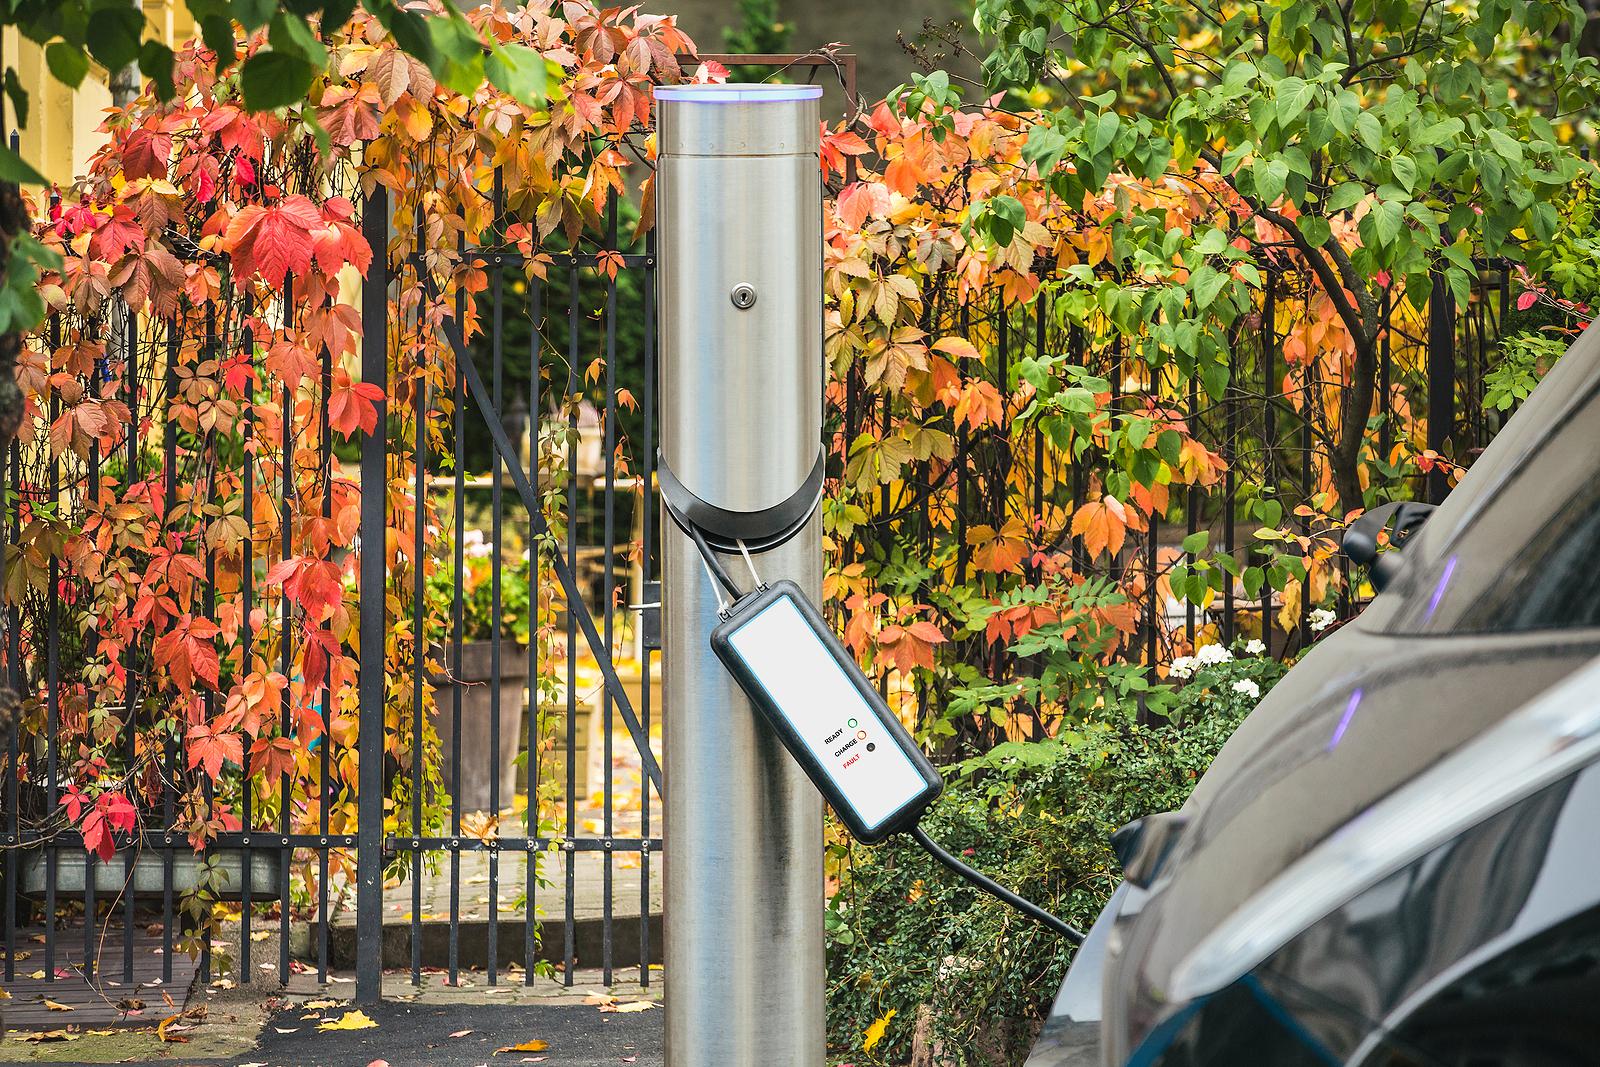 outdoor-ev-charging-station-urban-neighborhood-wilcox-electric-dc